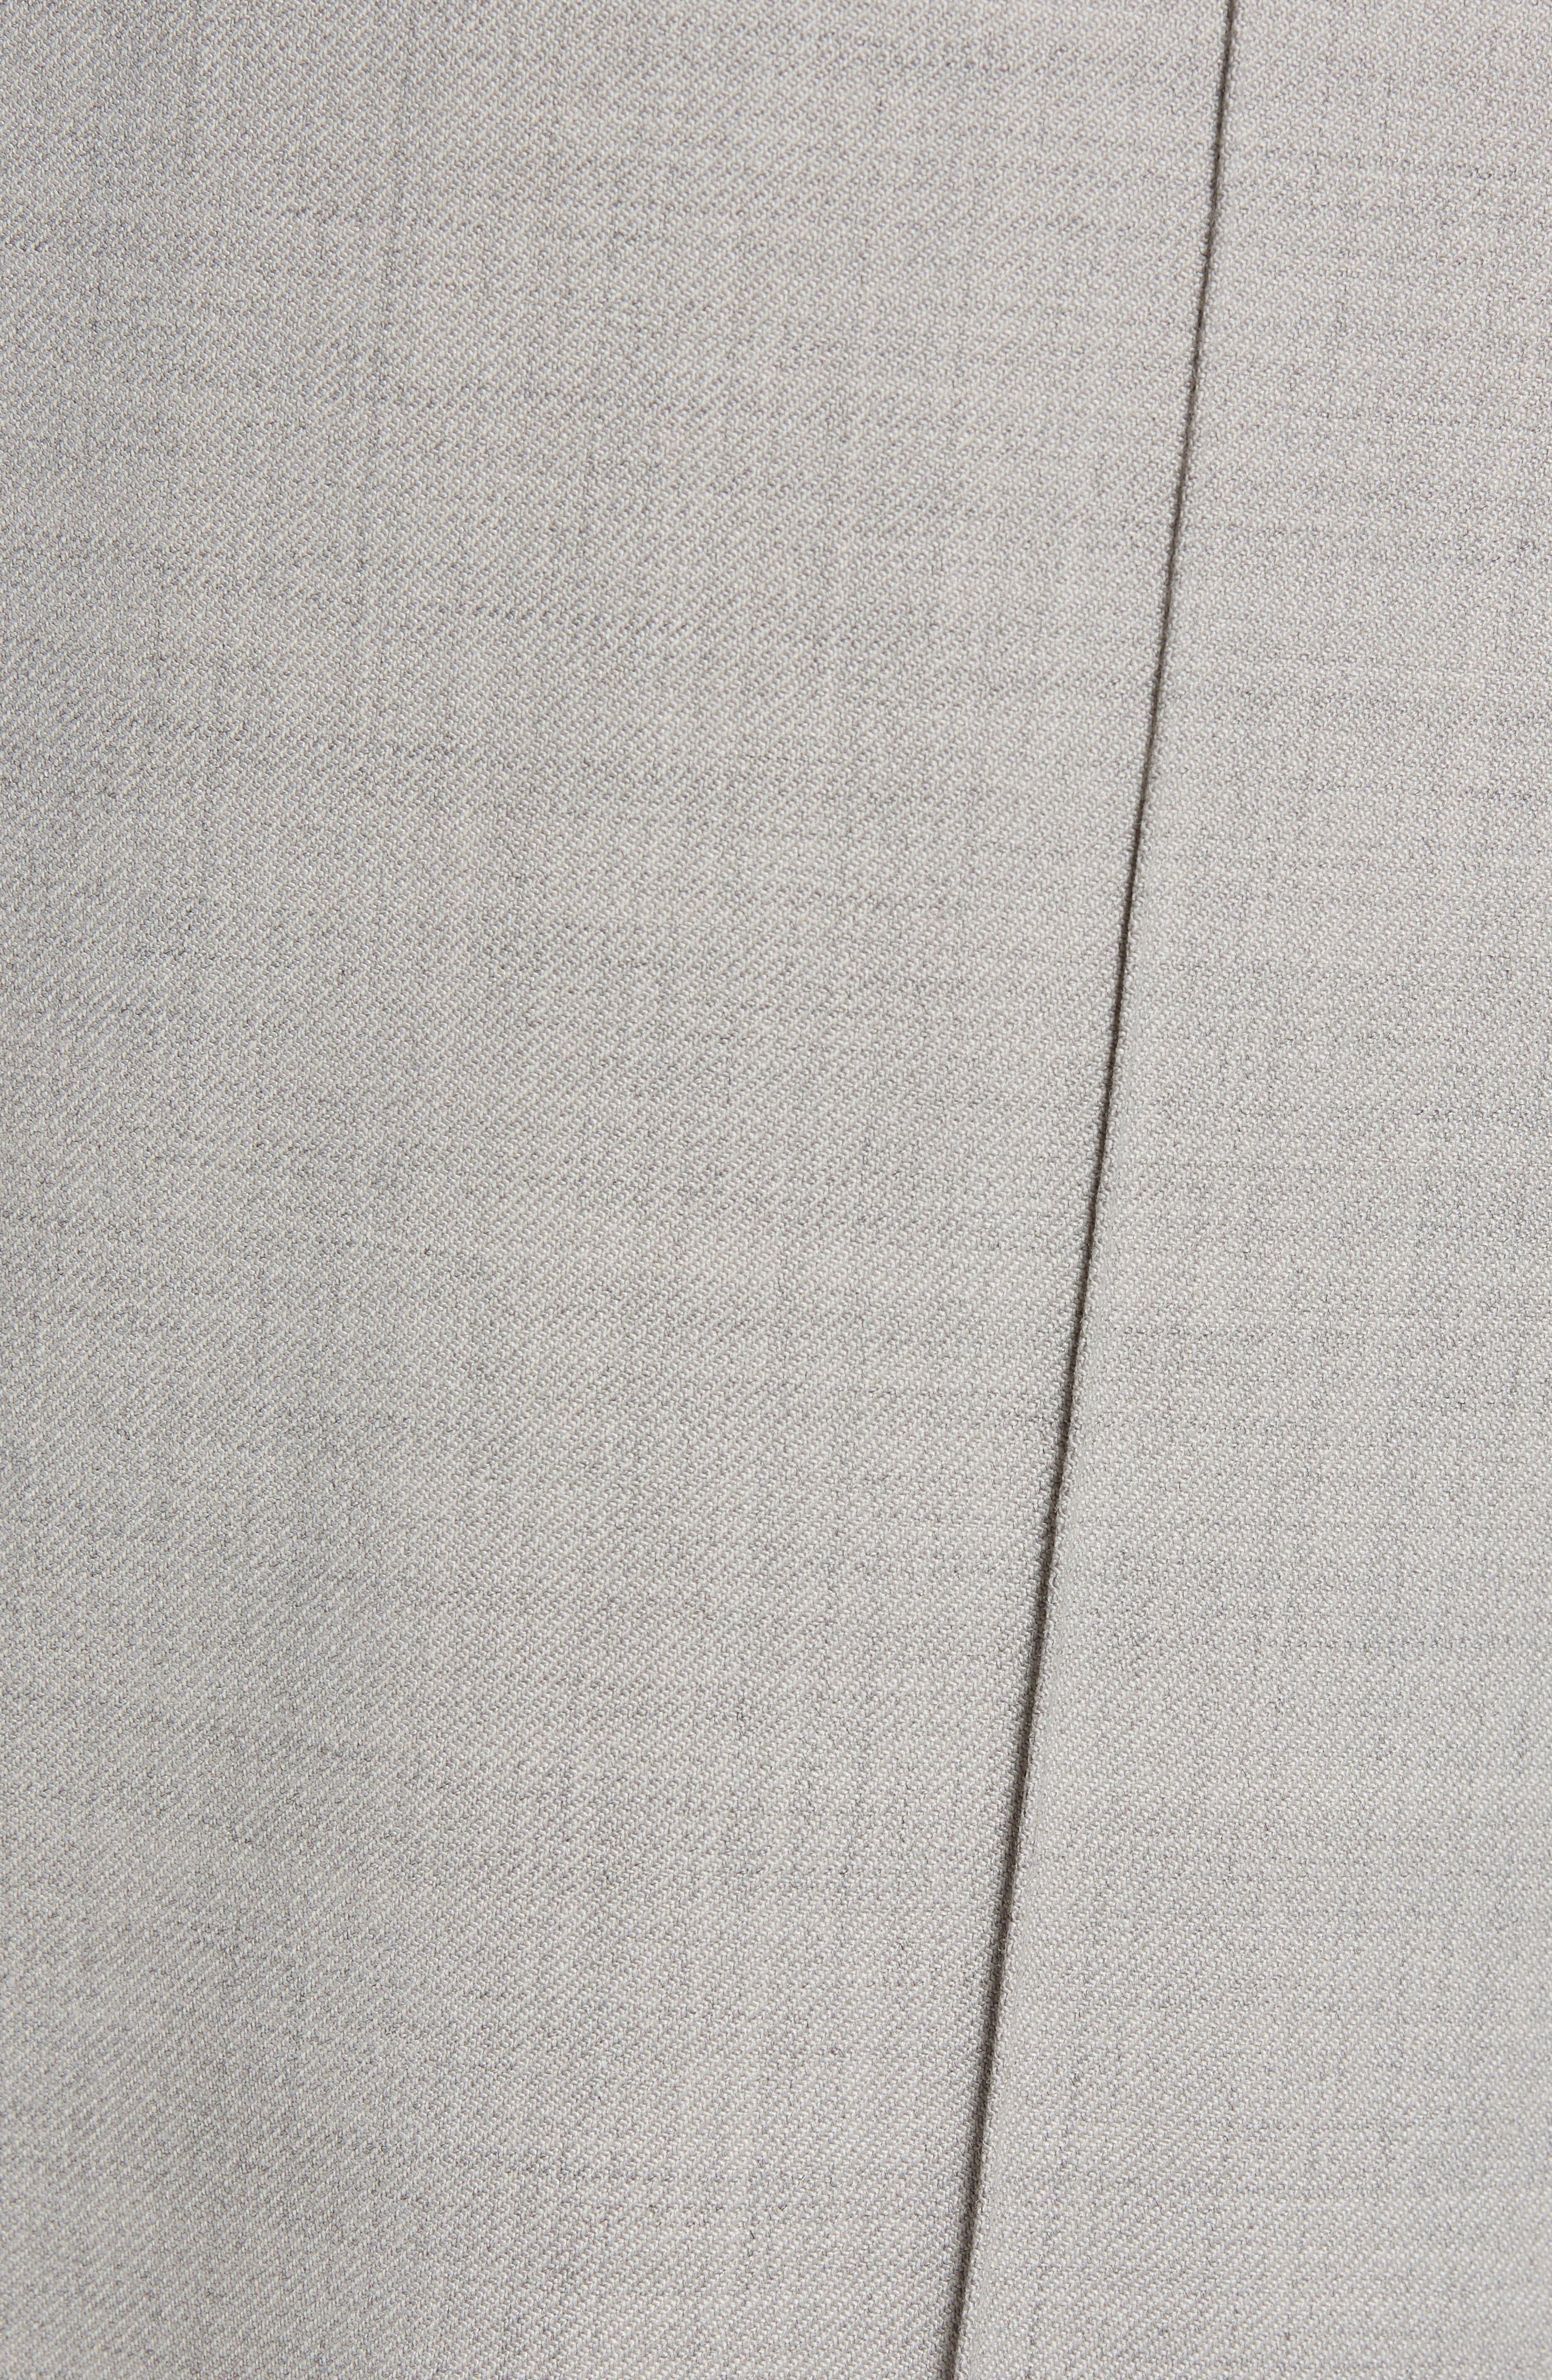 CLUB MONACO,                             Trim Fit Pintuck Pants,                             Alternate thumbnail 5, color,                             HEATHER GREY